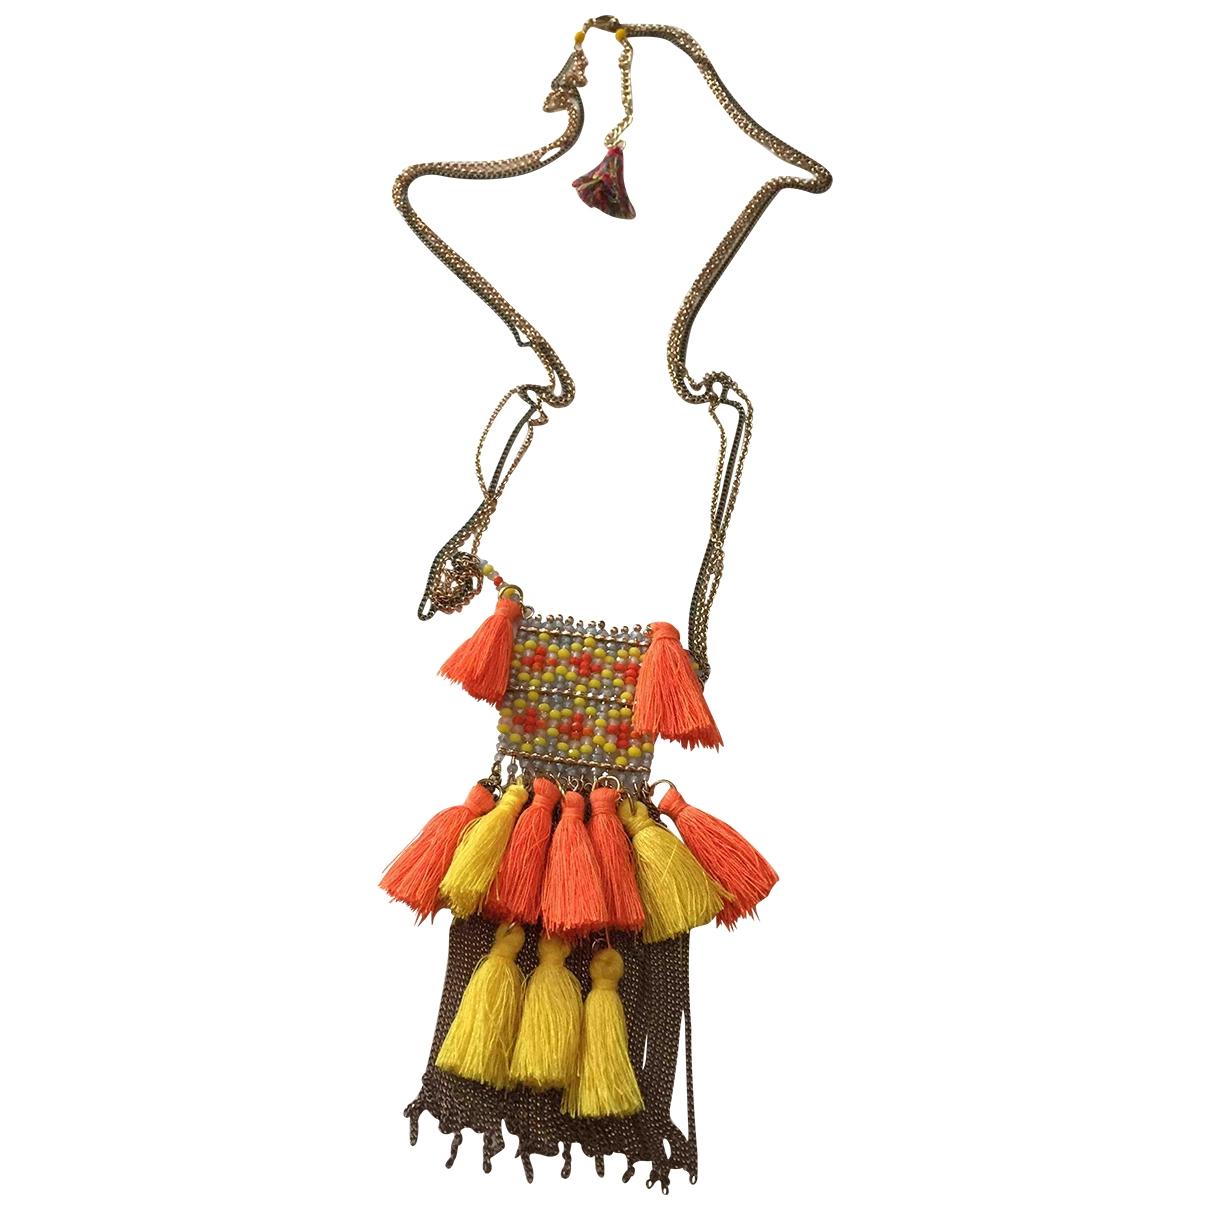 Collar Motifs Ethniques de Lona Non Signe / Unsigned